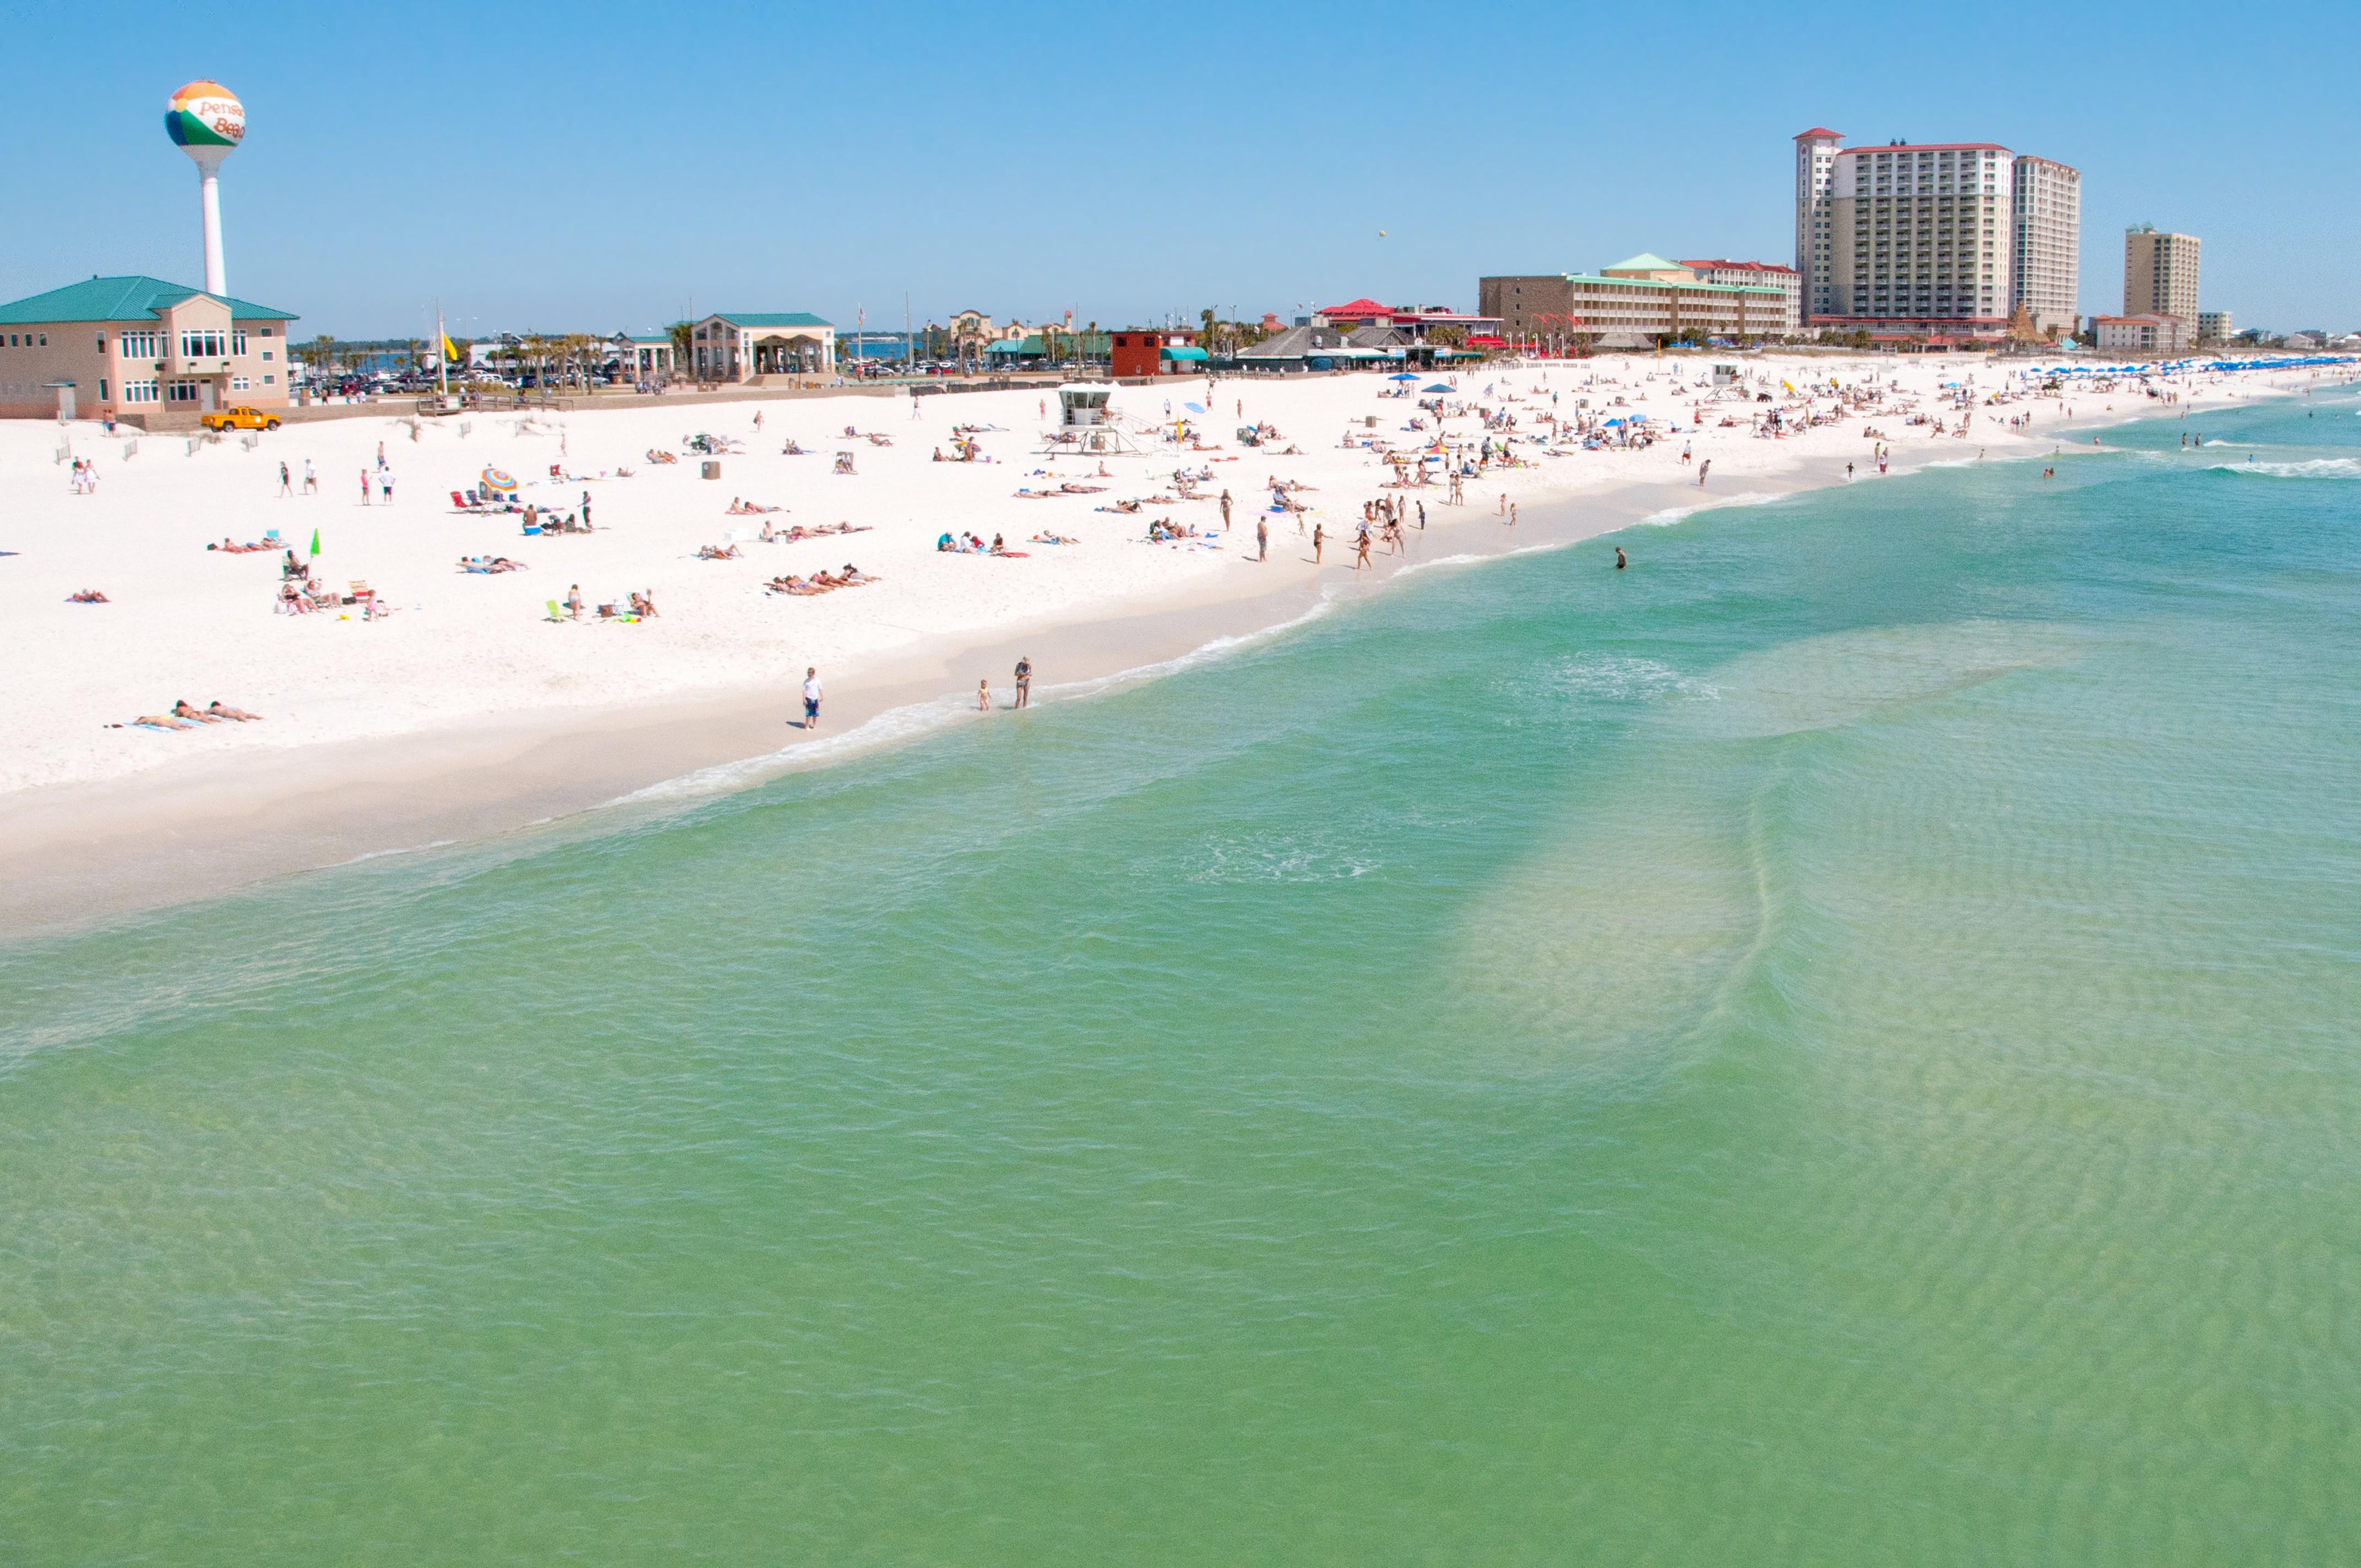 Florida beaches now feature sea lice | Blogs